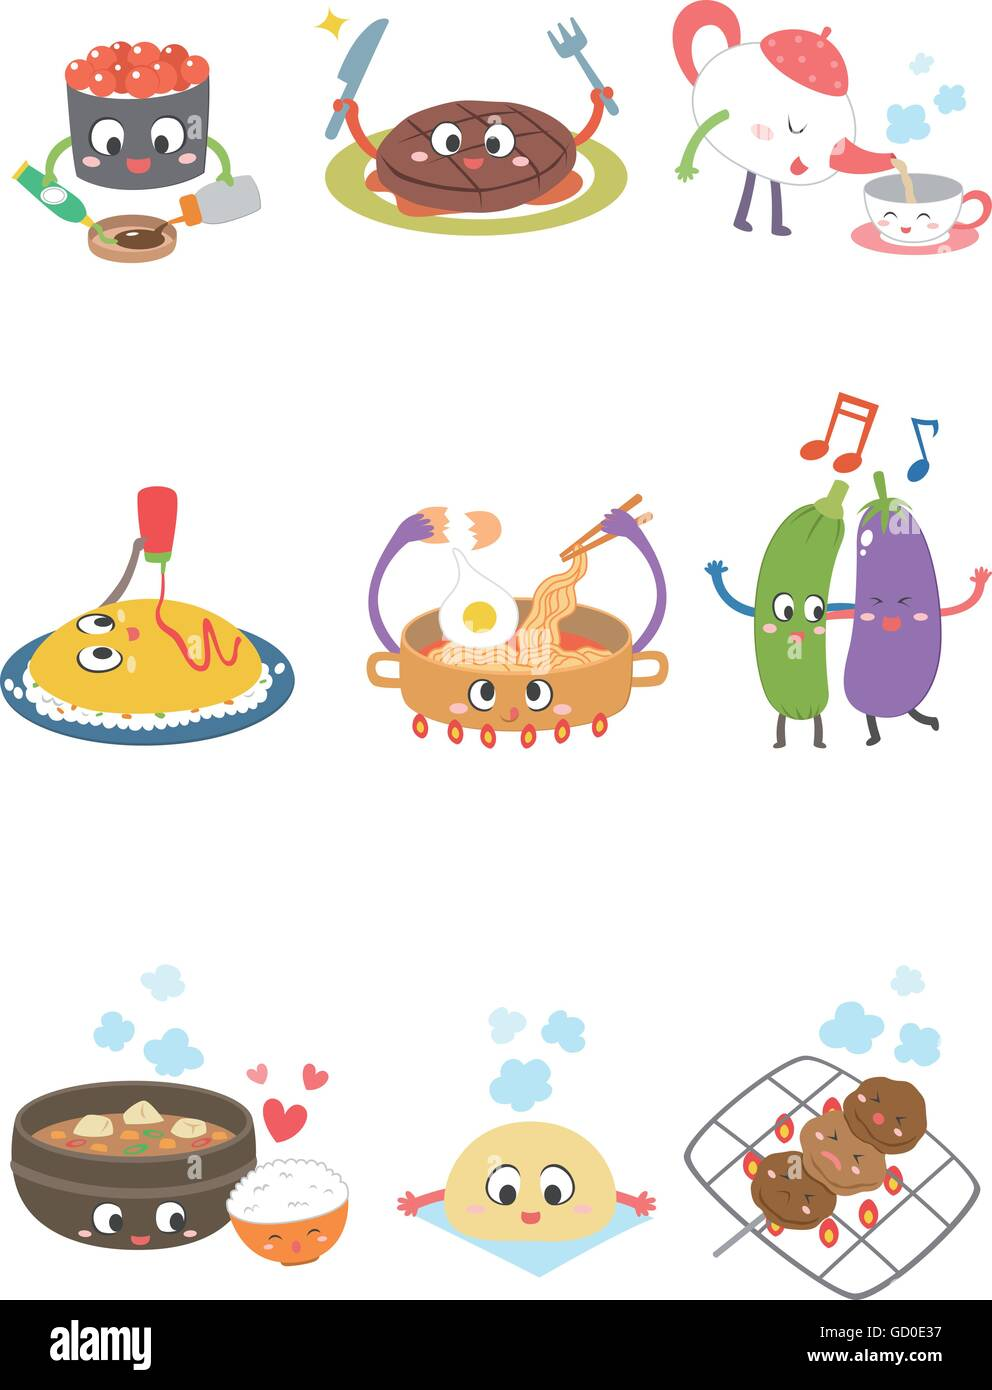 Character food - Stock Vector